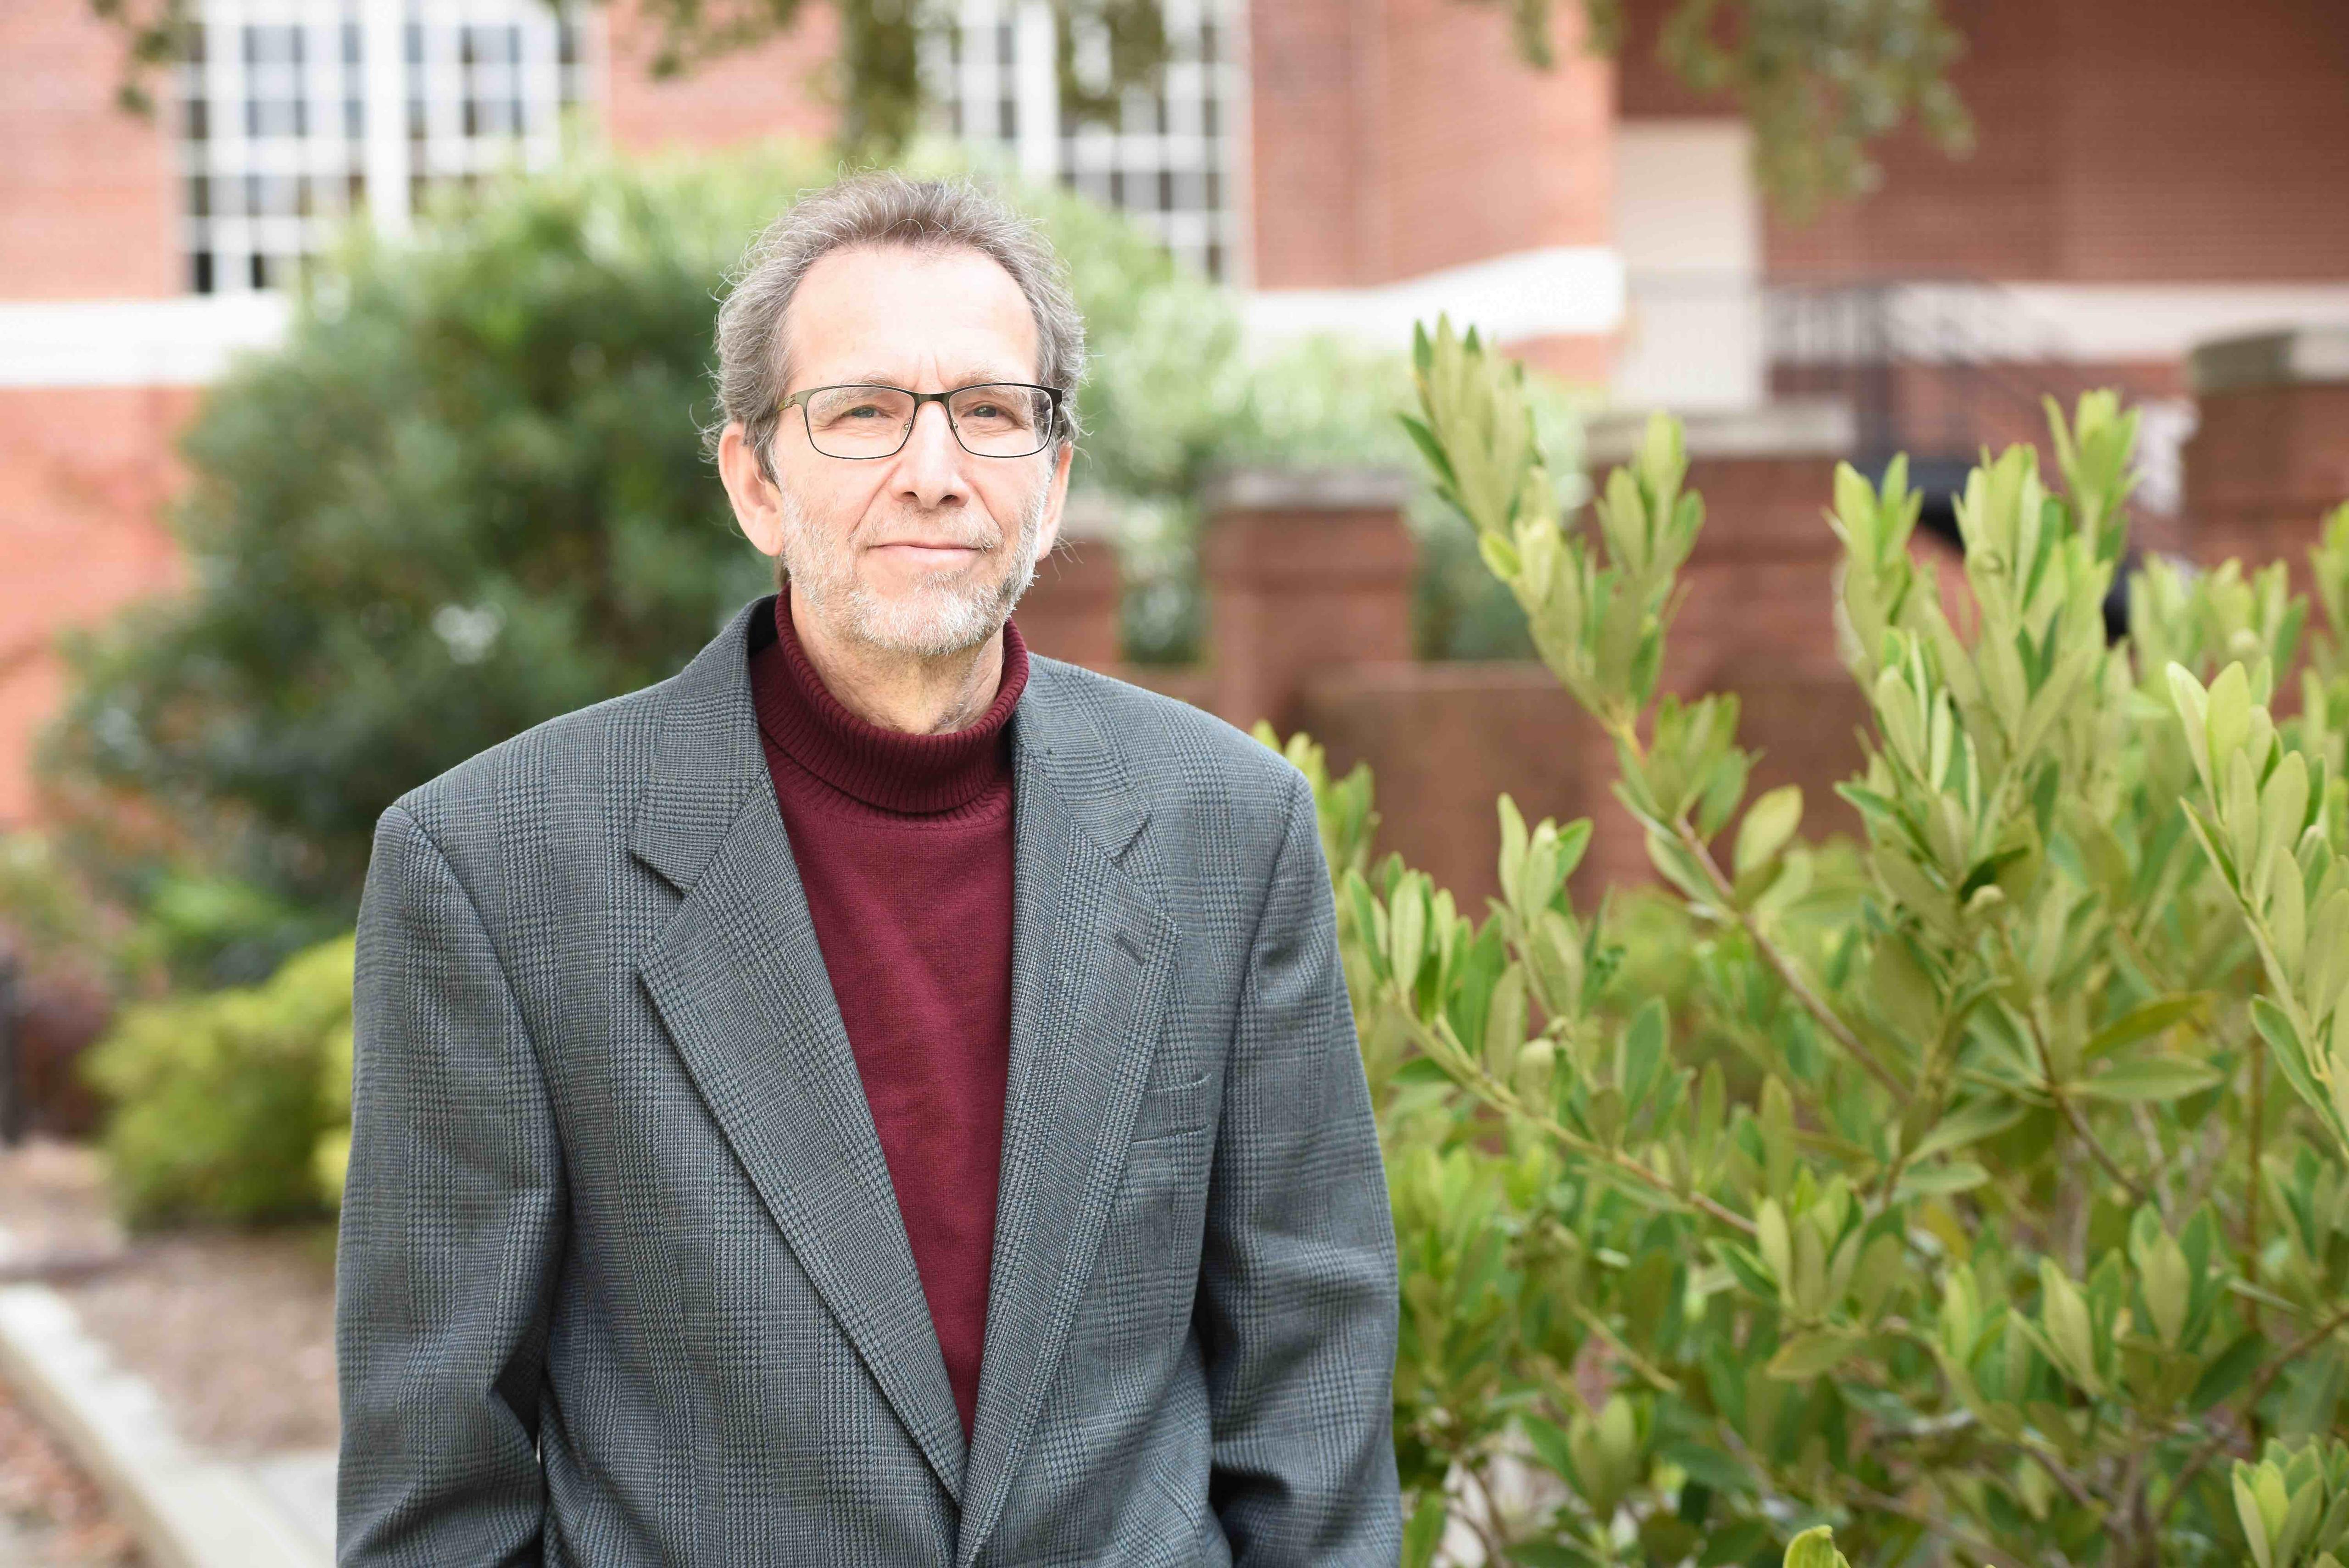 Dr. James Schiffman